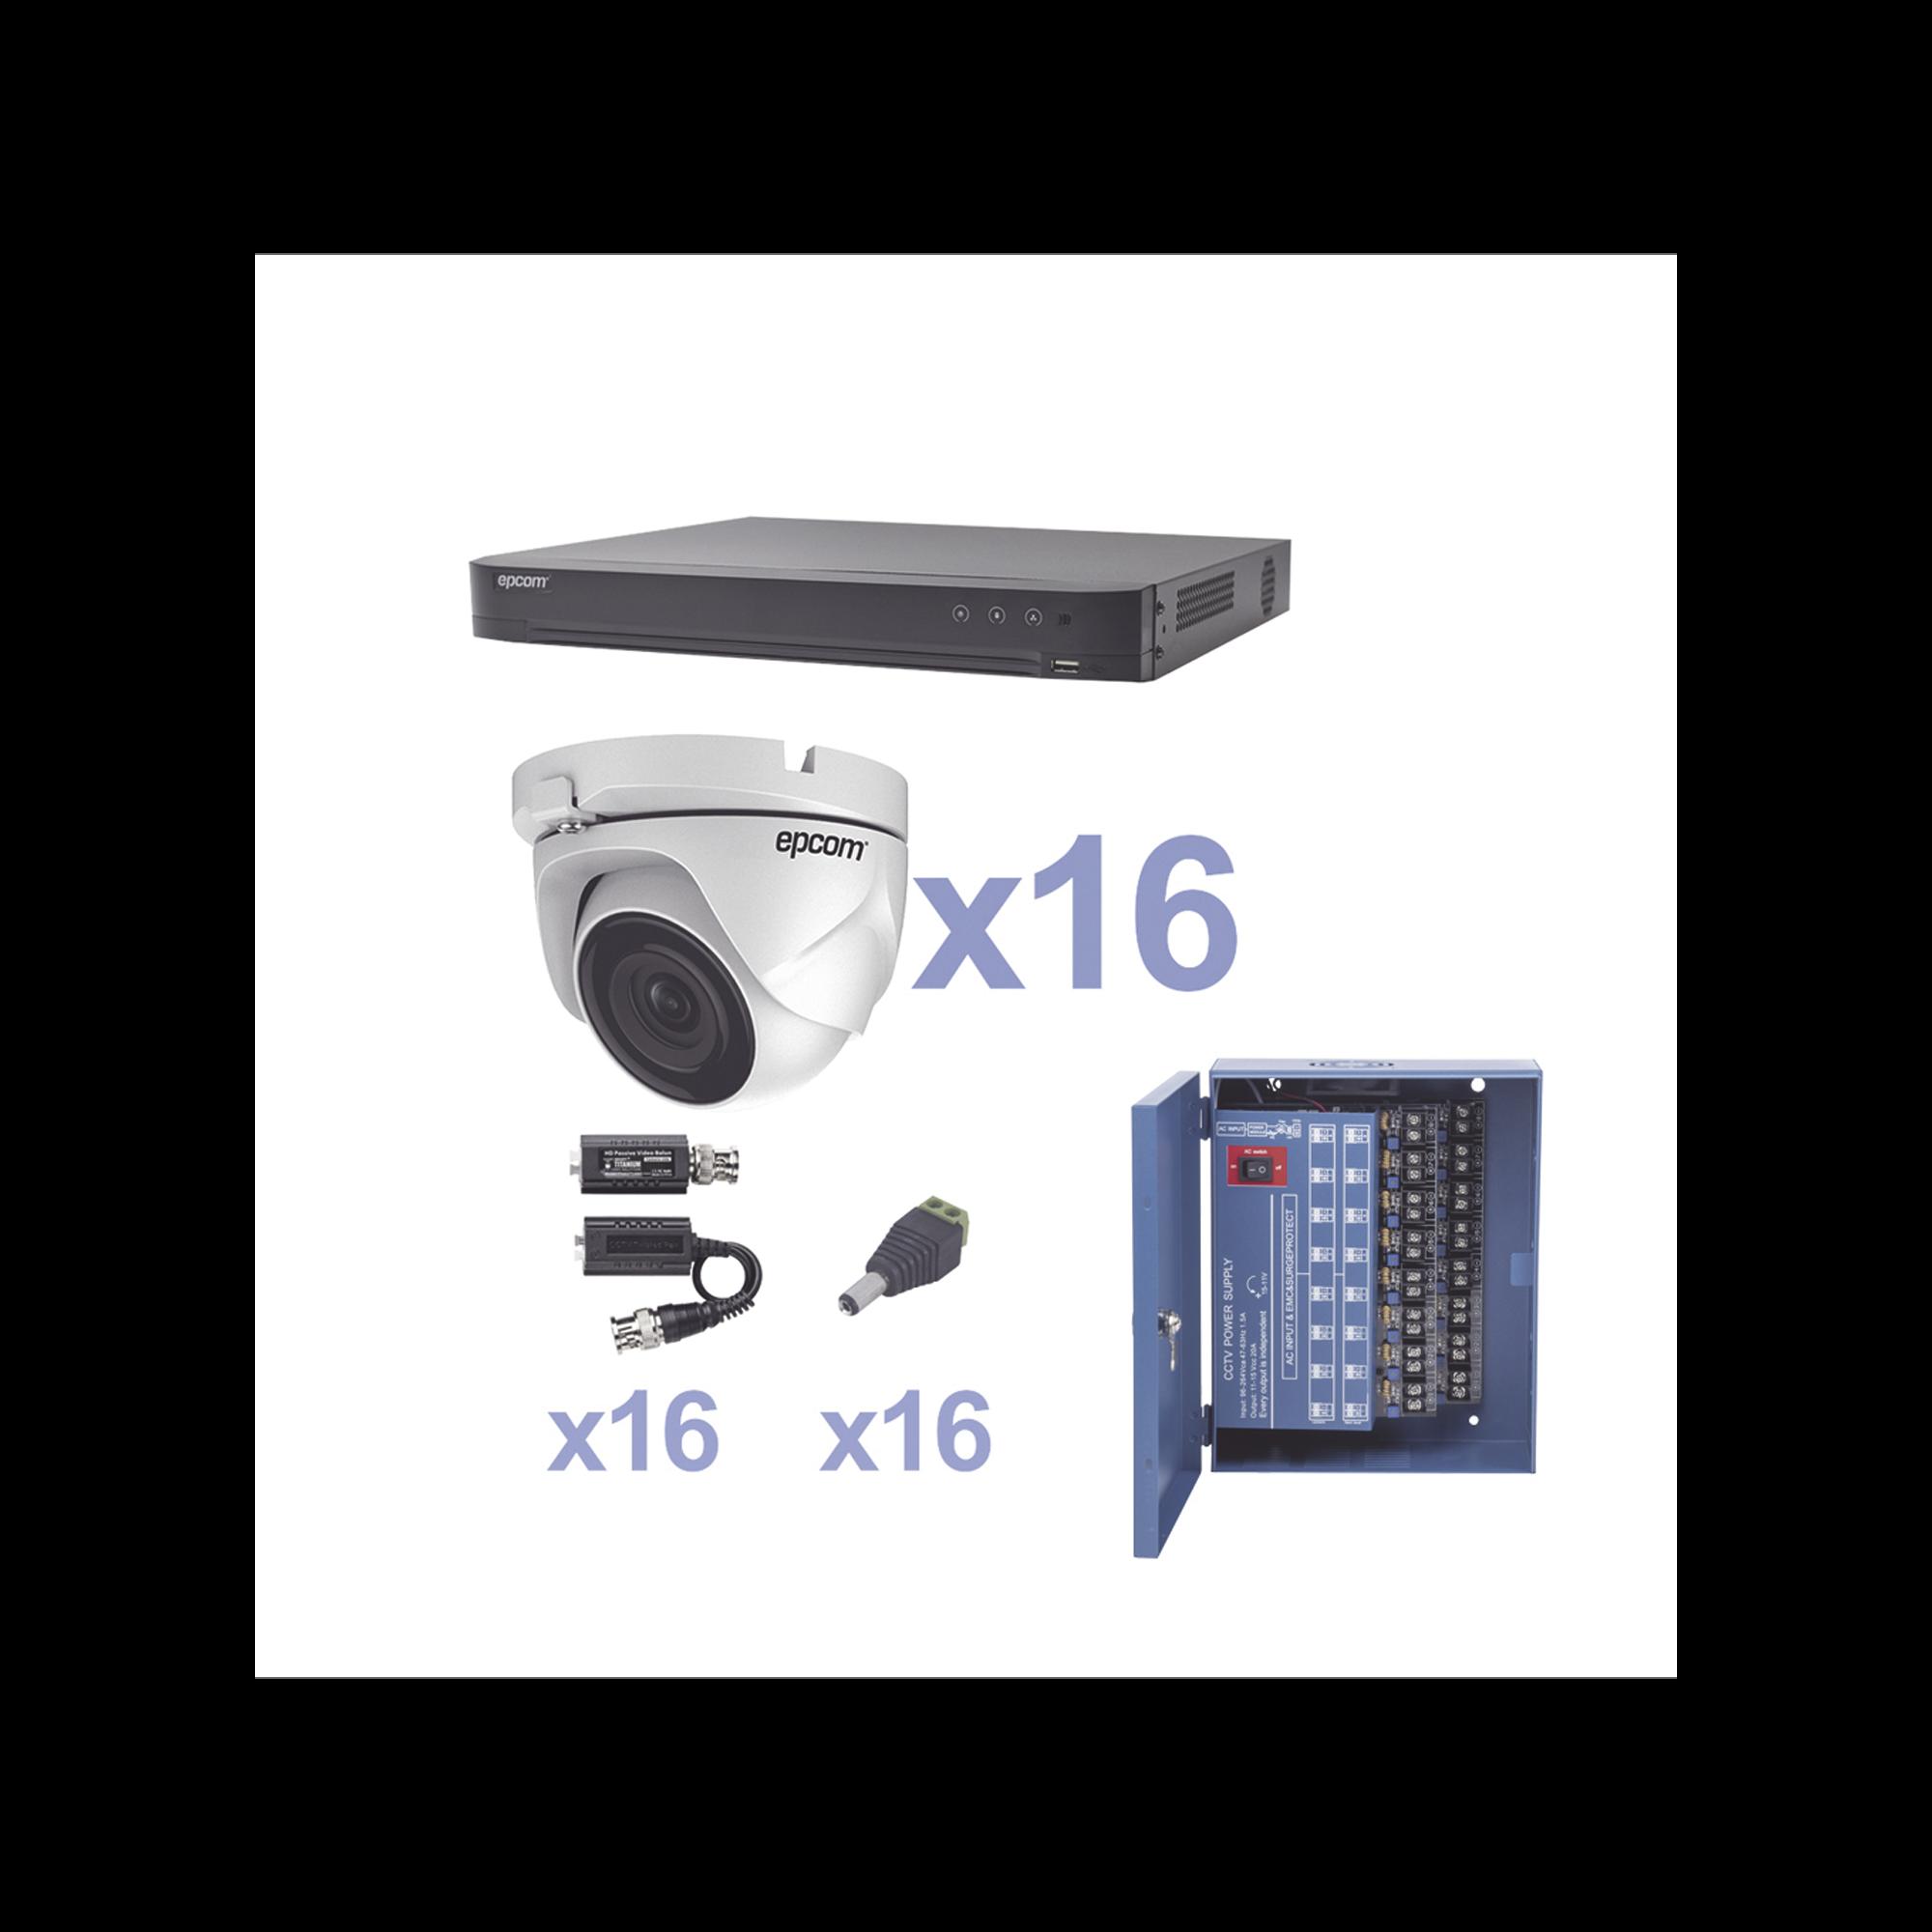 KIT TurboHD 1080p / DVR 16 Canales / 16 Cámaras Eyeball (exterior 2.8 mm) / Transceptores / Conectores / Fuente de Poder Profesional